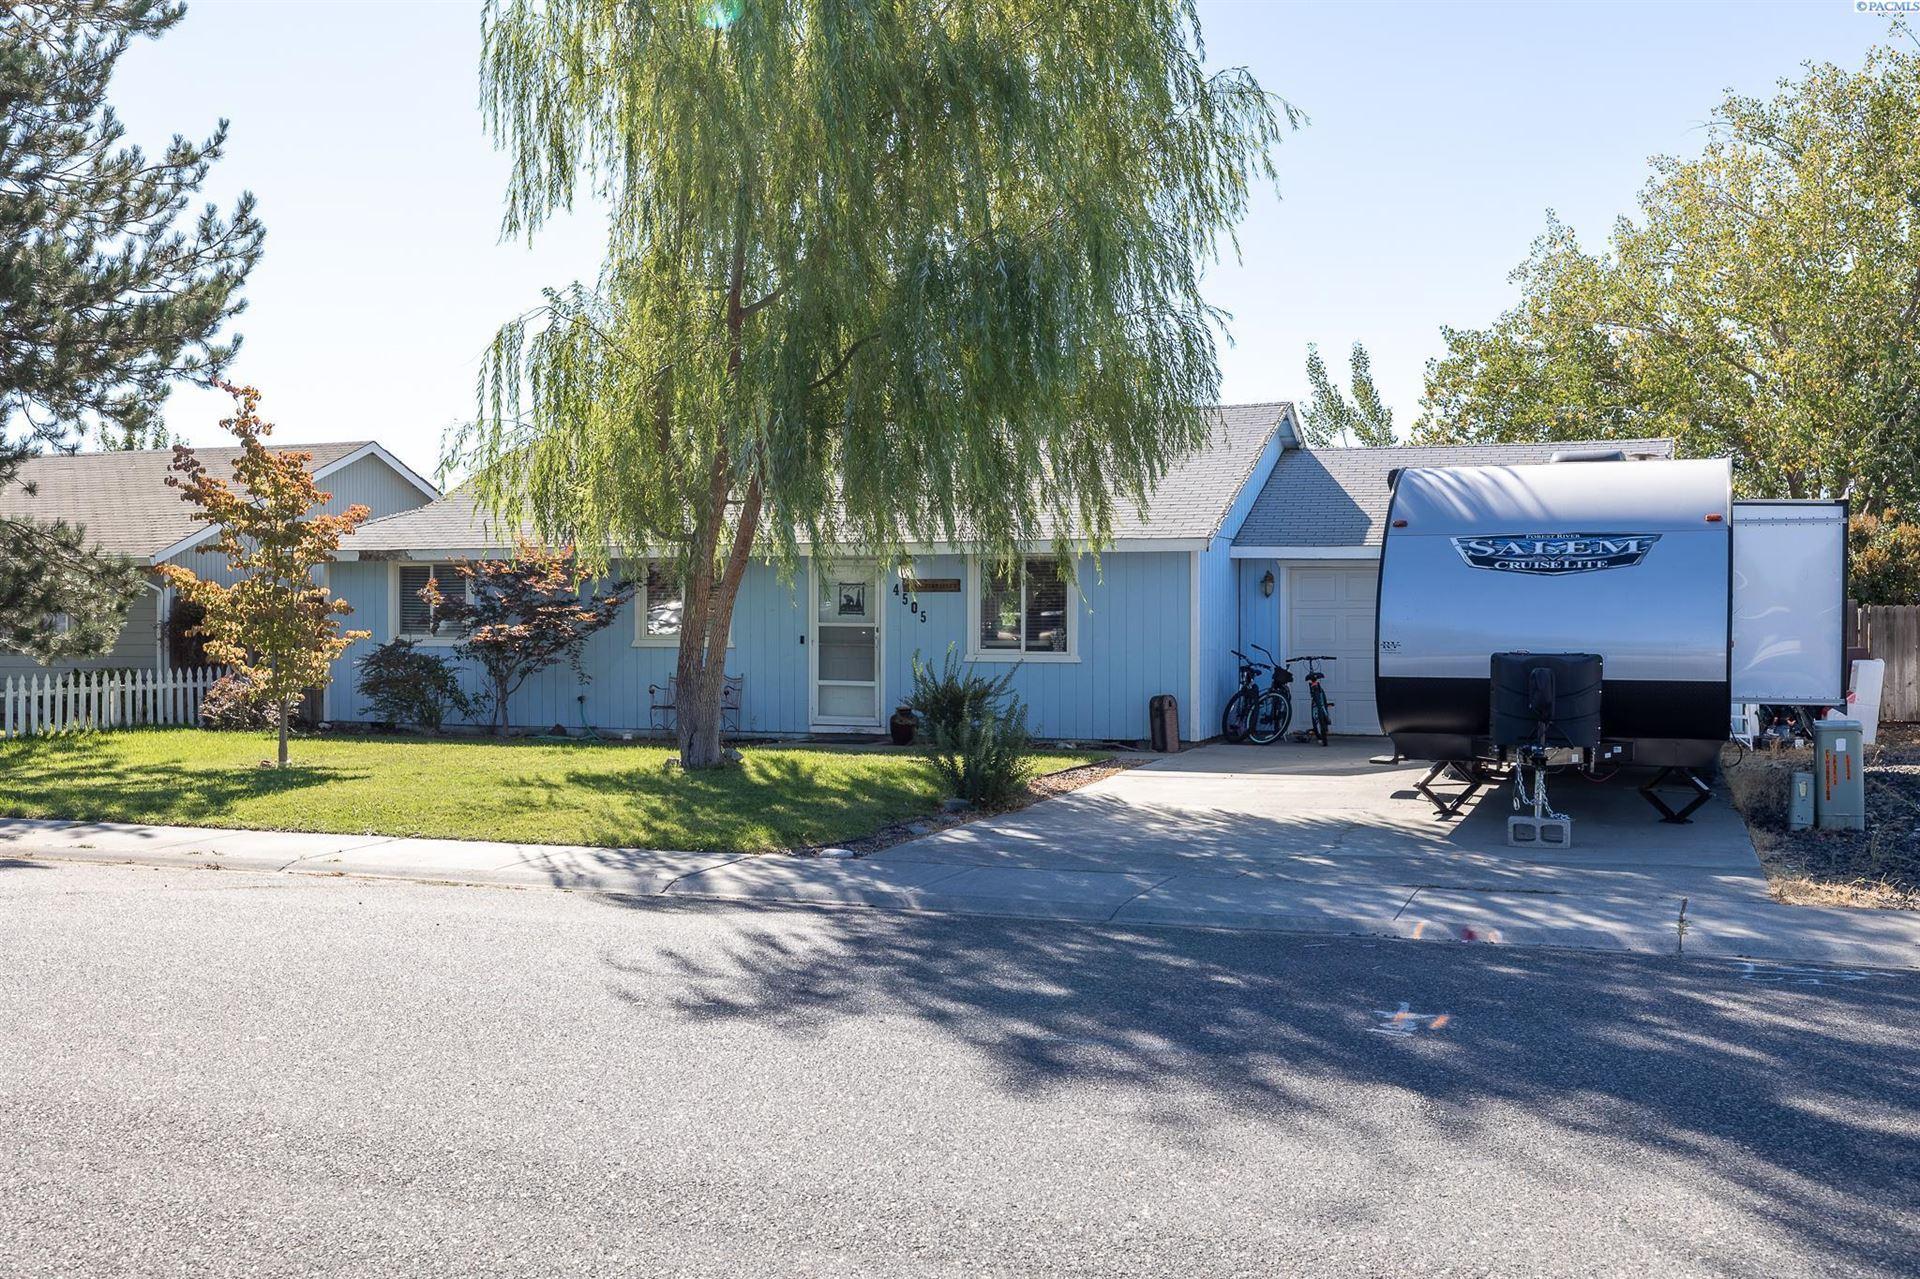 Photo of 4505 Holly Way, West Richland, WA 99353 (MLS # 256606)